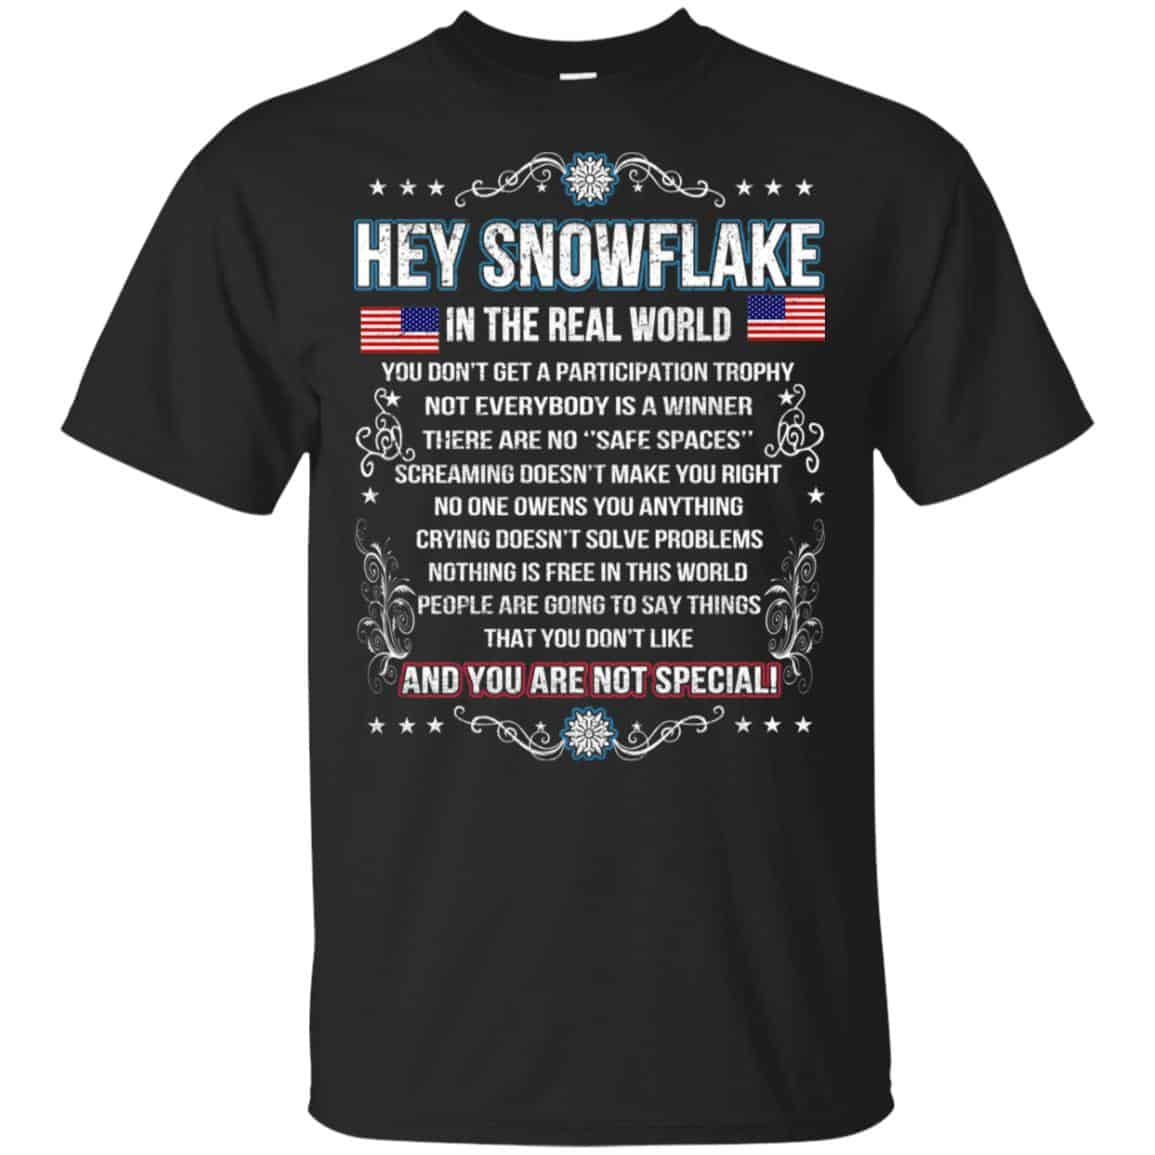 World of Tanks Snowflake Sweatshirt